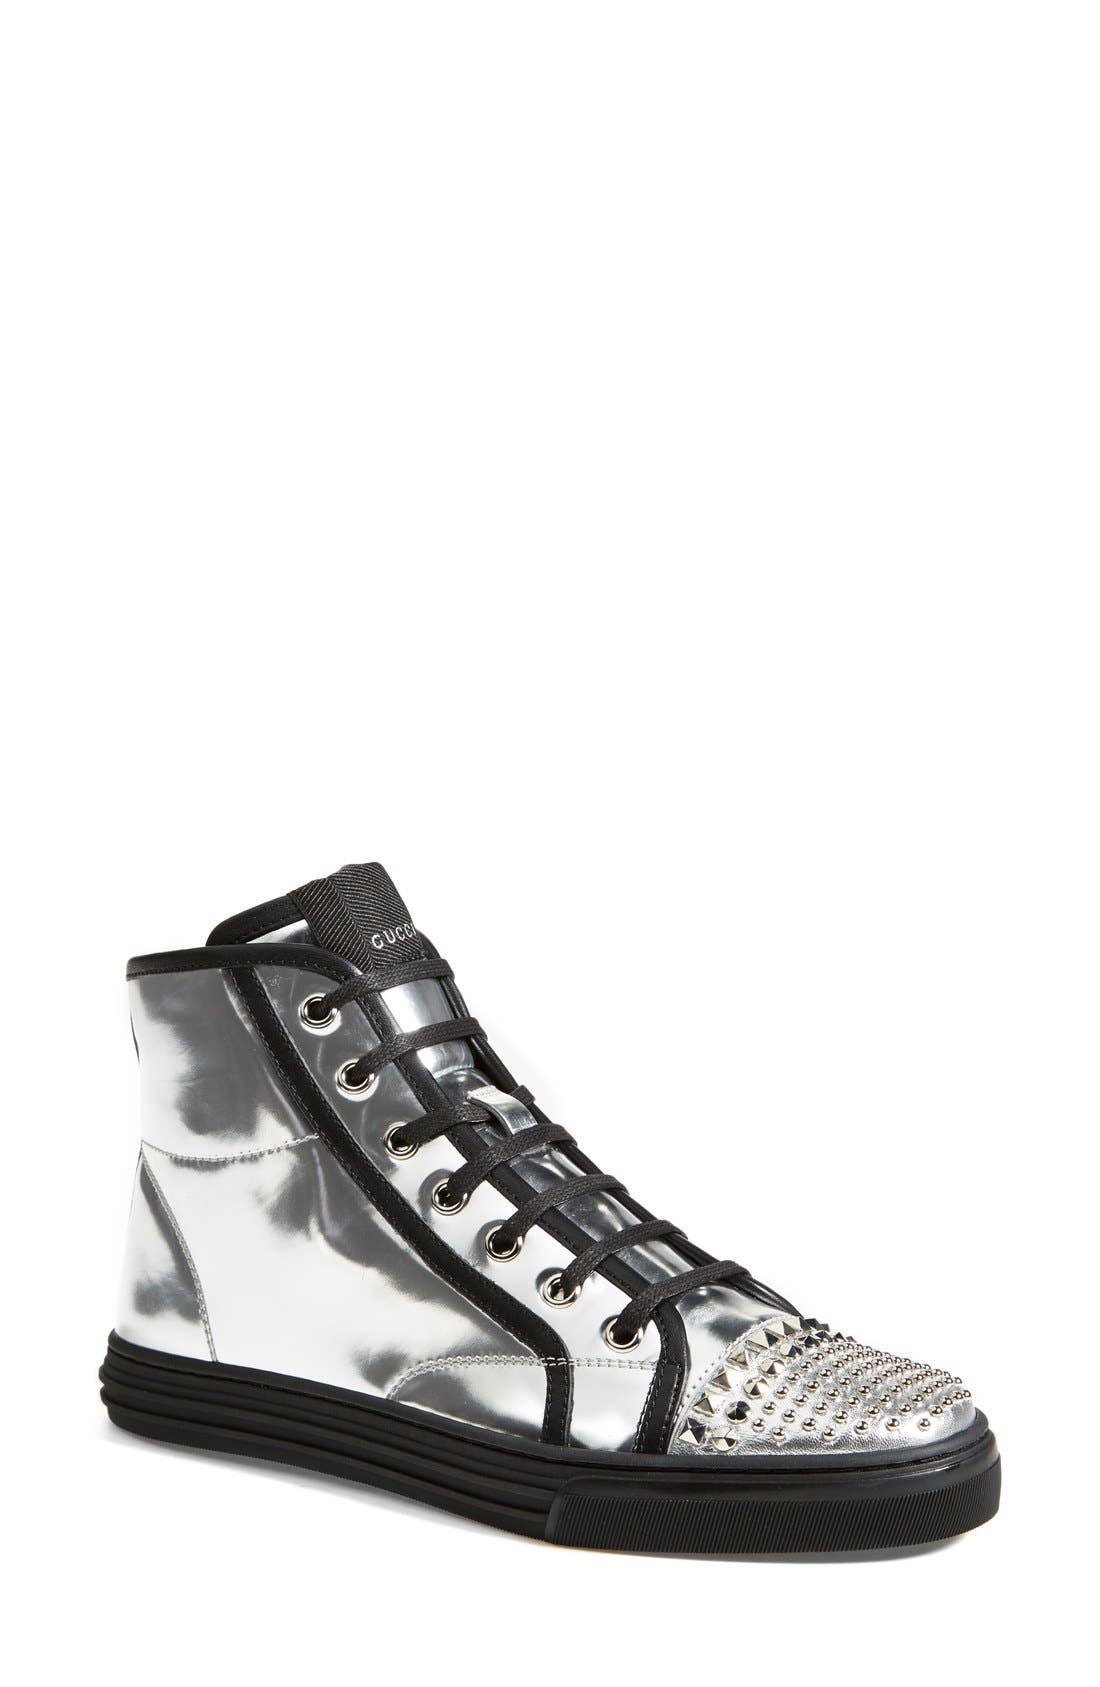 Main Image - Gucci 'California' Studded Sneaker (Women)